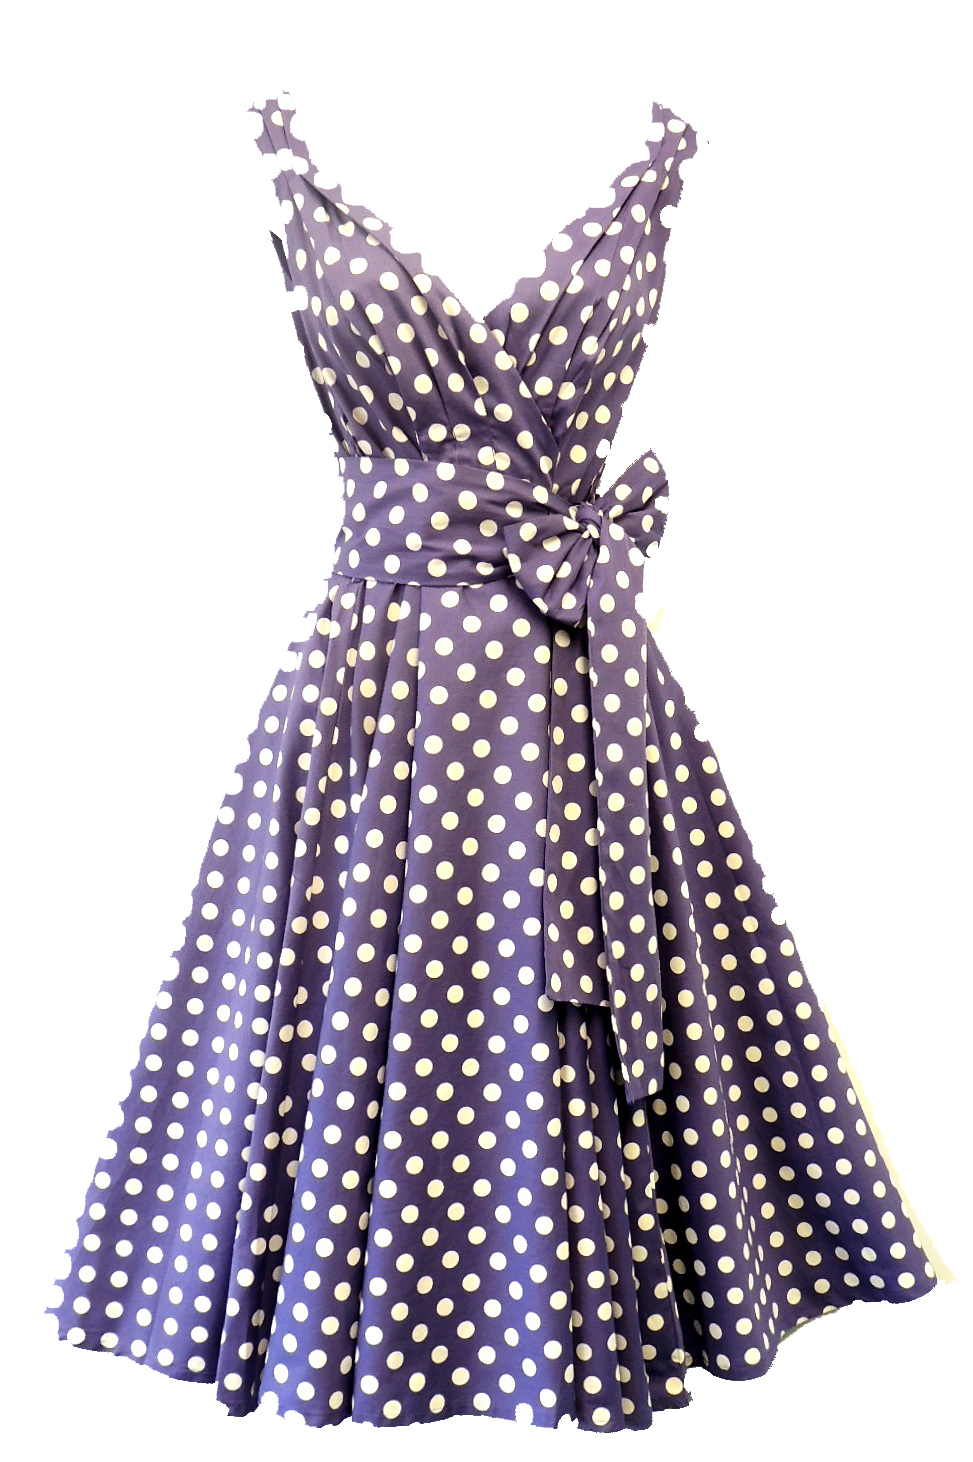 neu spot pin up vintage1950s style weicher lila punkt swing nachmittagskleid ebay. Black Bedroom Furniture Sets. Home Design Ideas